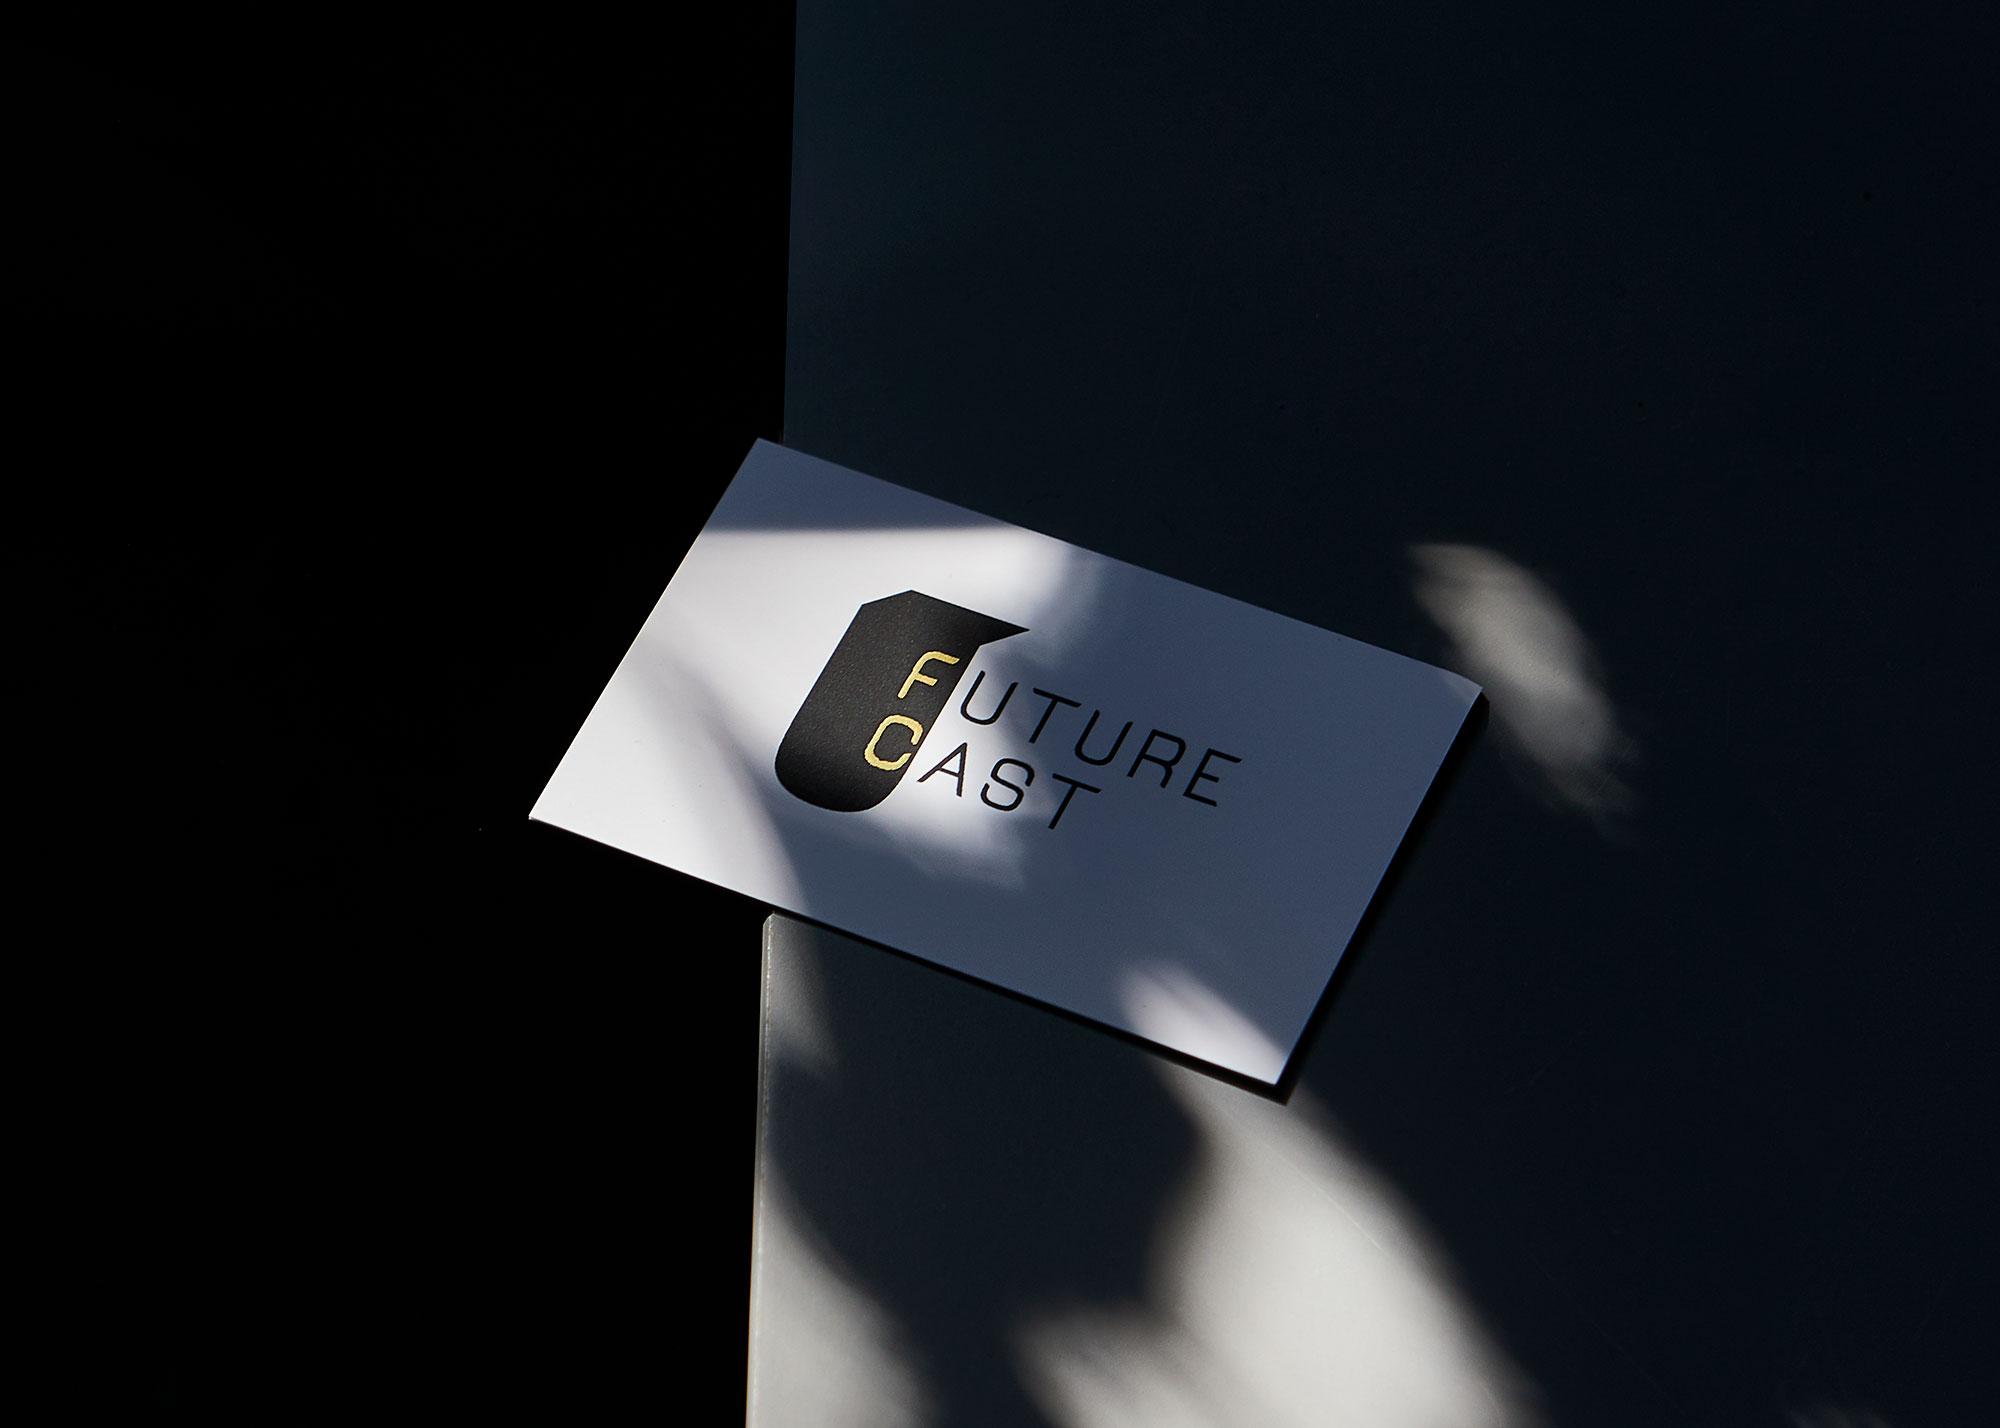 FUTURE CAST - Branding, business cards and website development